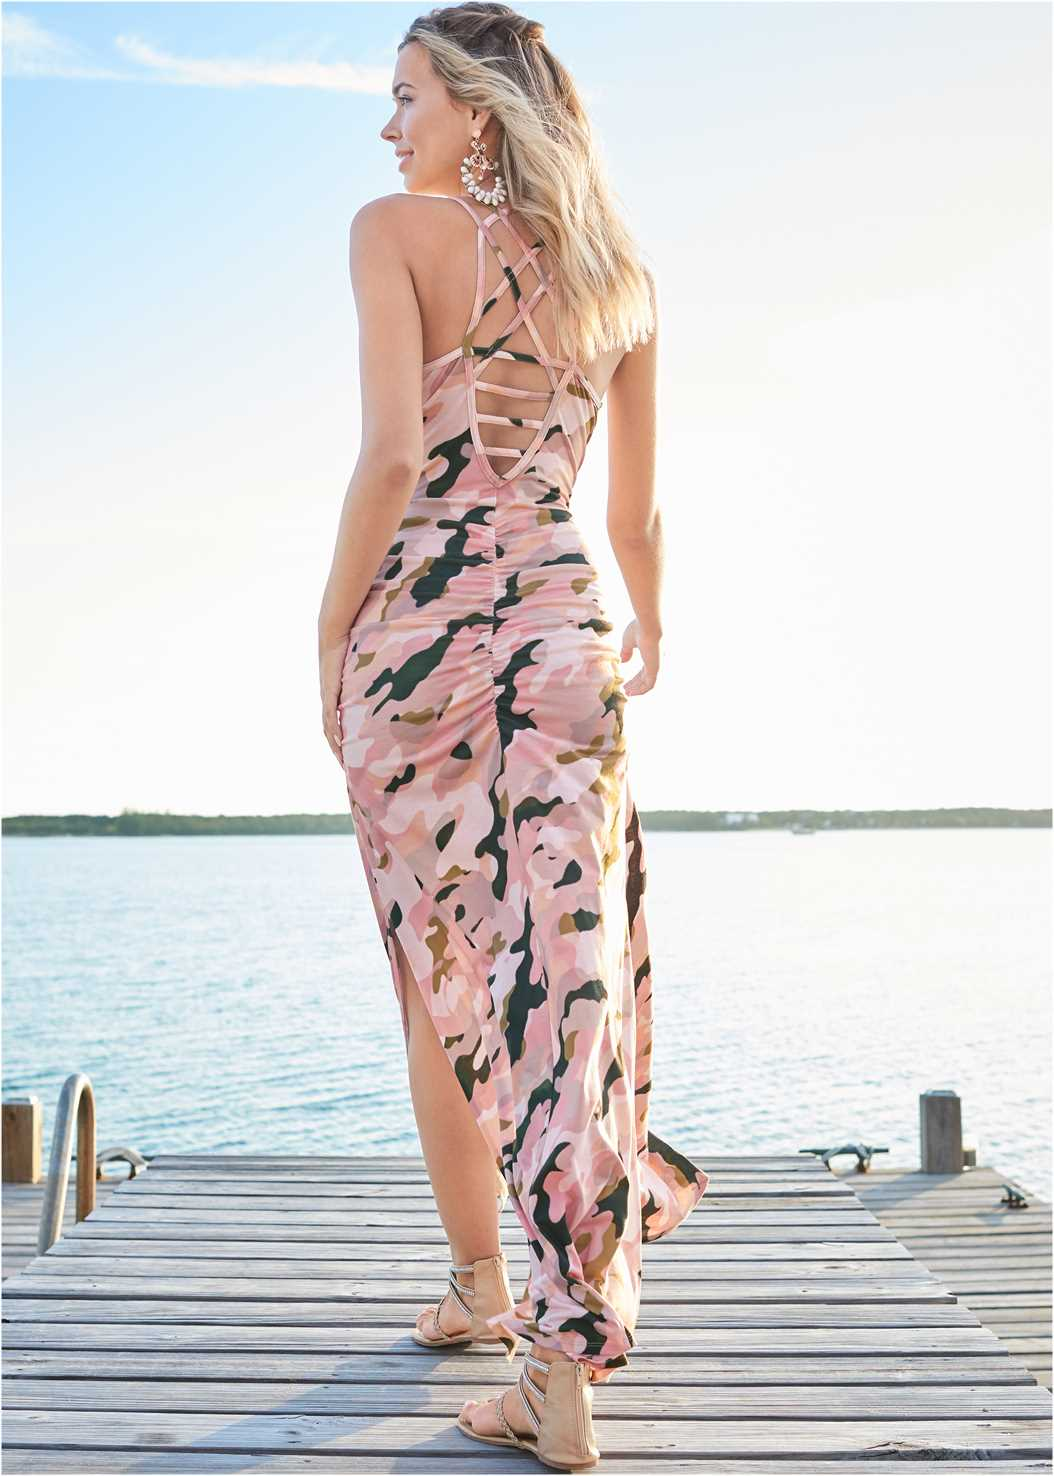 Camo Maxi Dress,Shell Detail Sandals,Statement Earrings